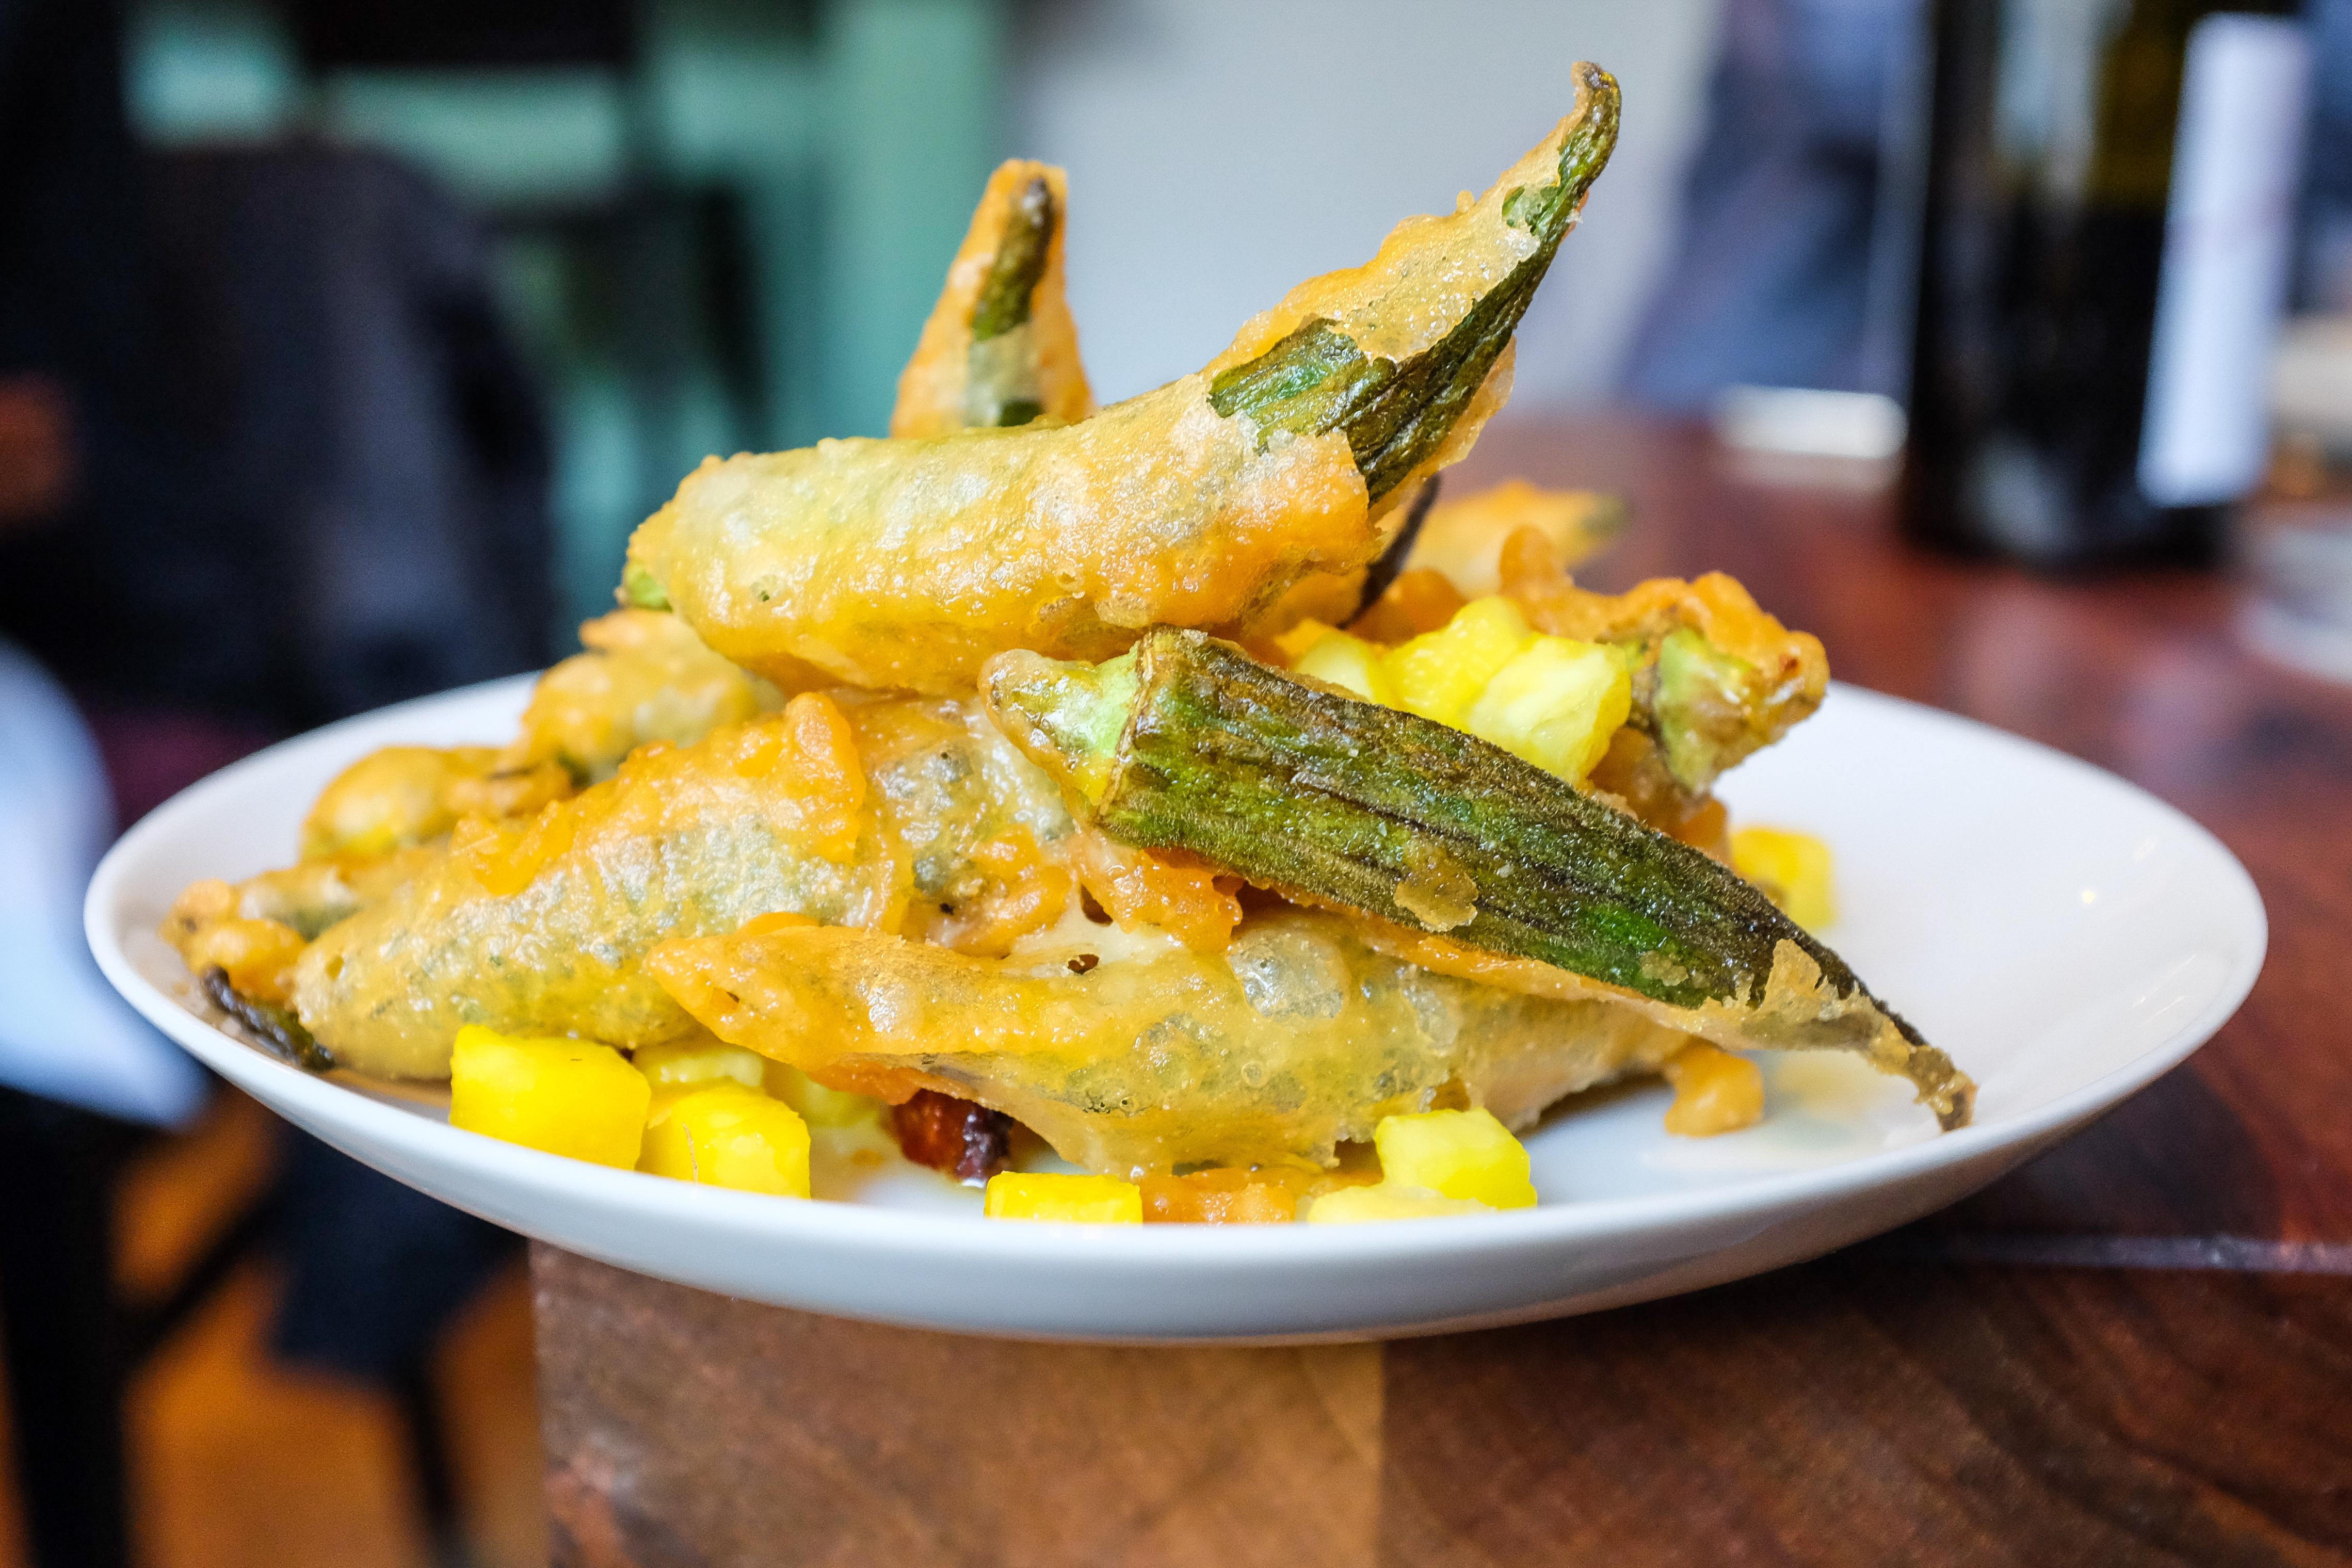 Fried okra at Salare.